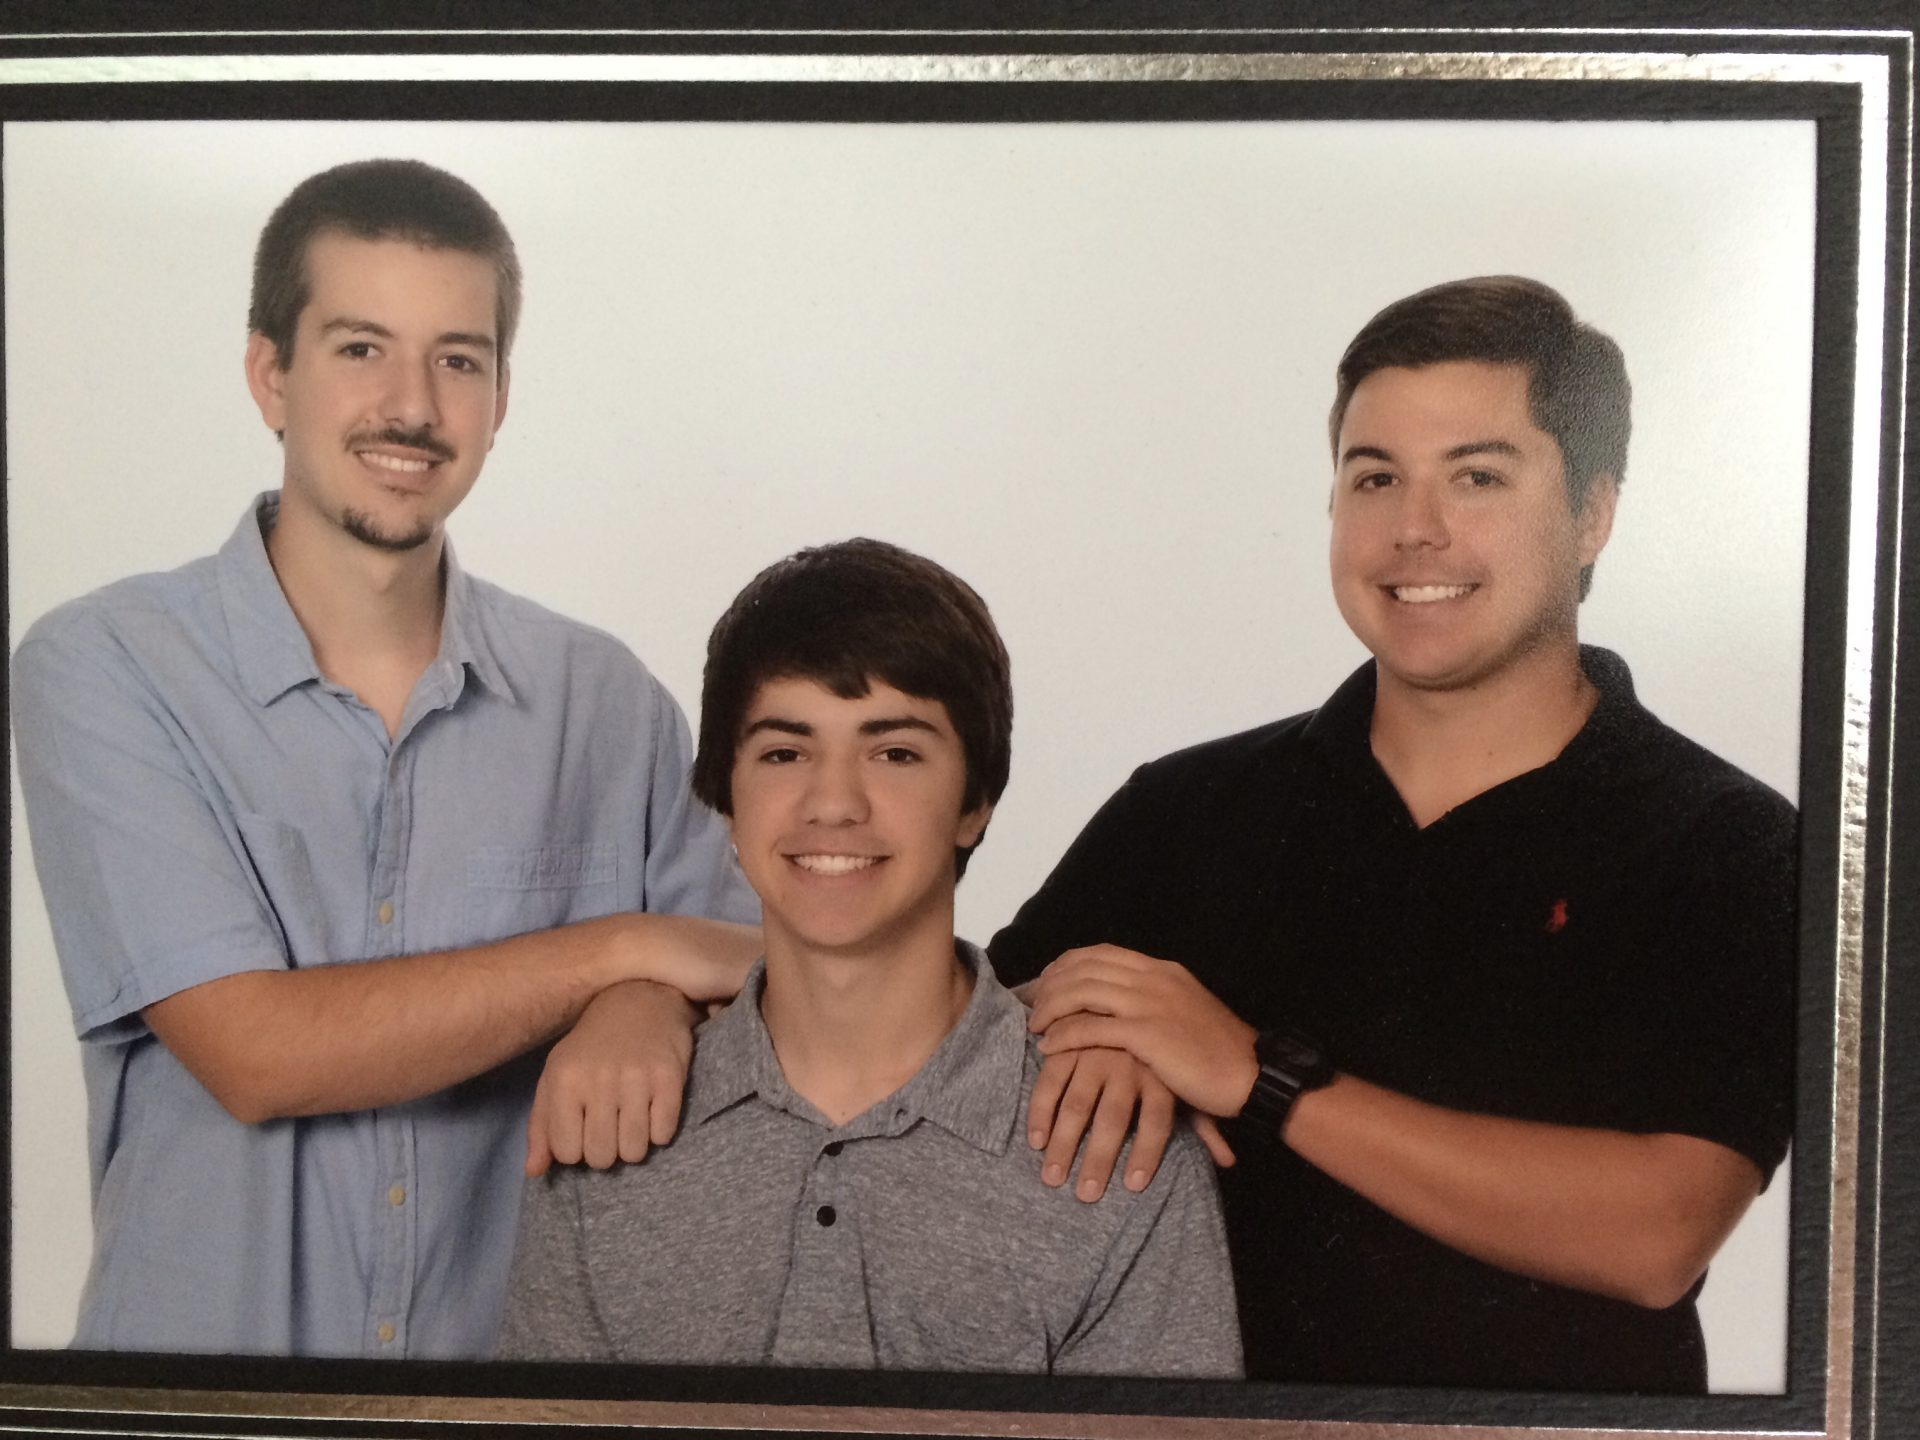 Grandsons!